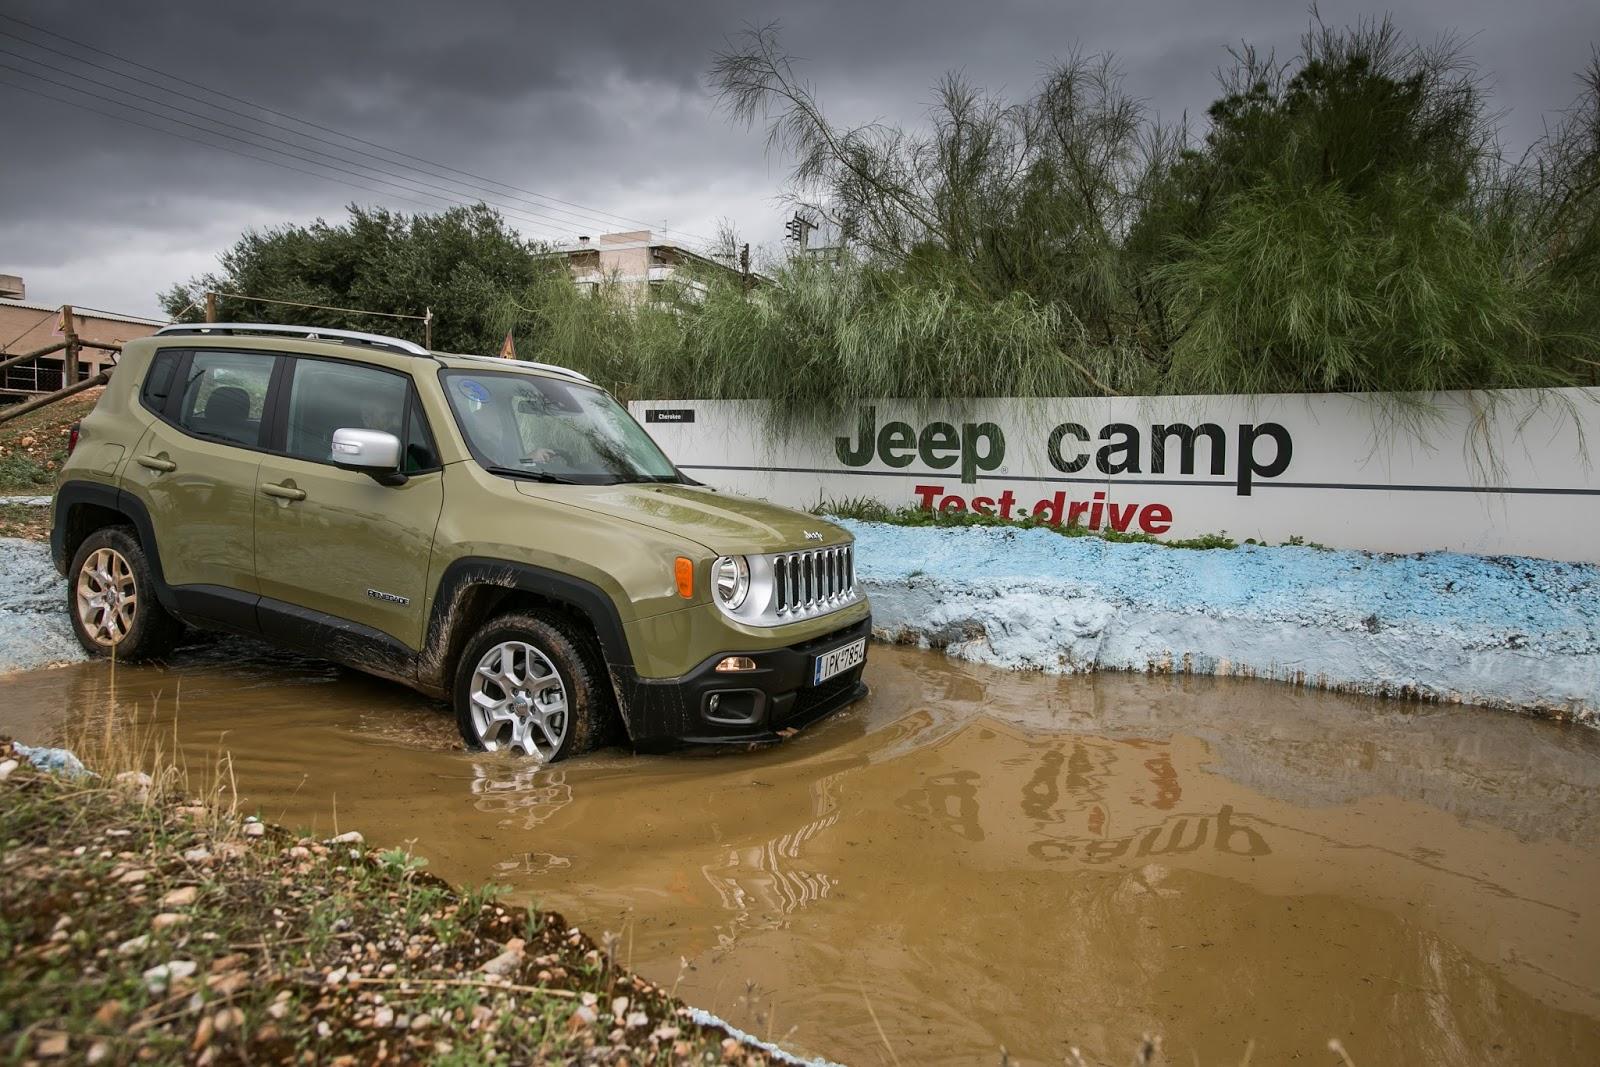 JEEP%2BCAMP GK 0446 Πετάμε ένα Jeep Renegade σε λάσπες, πέτρες, άμμο, λίμνες. Θα τα καταφέρει;